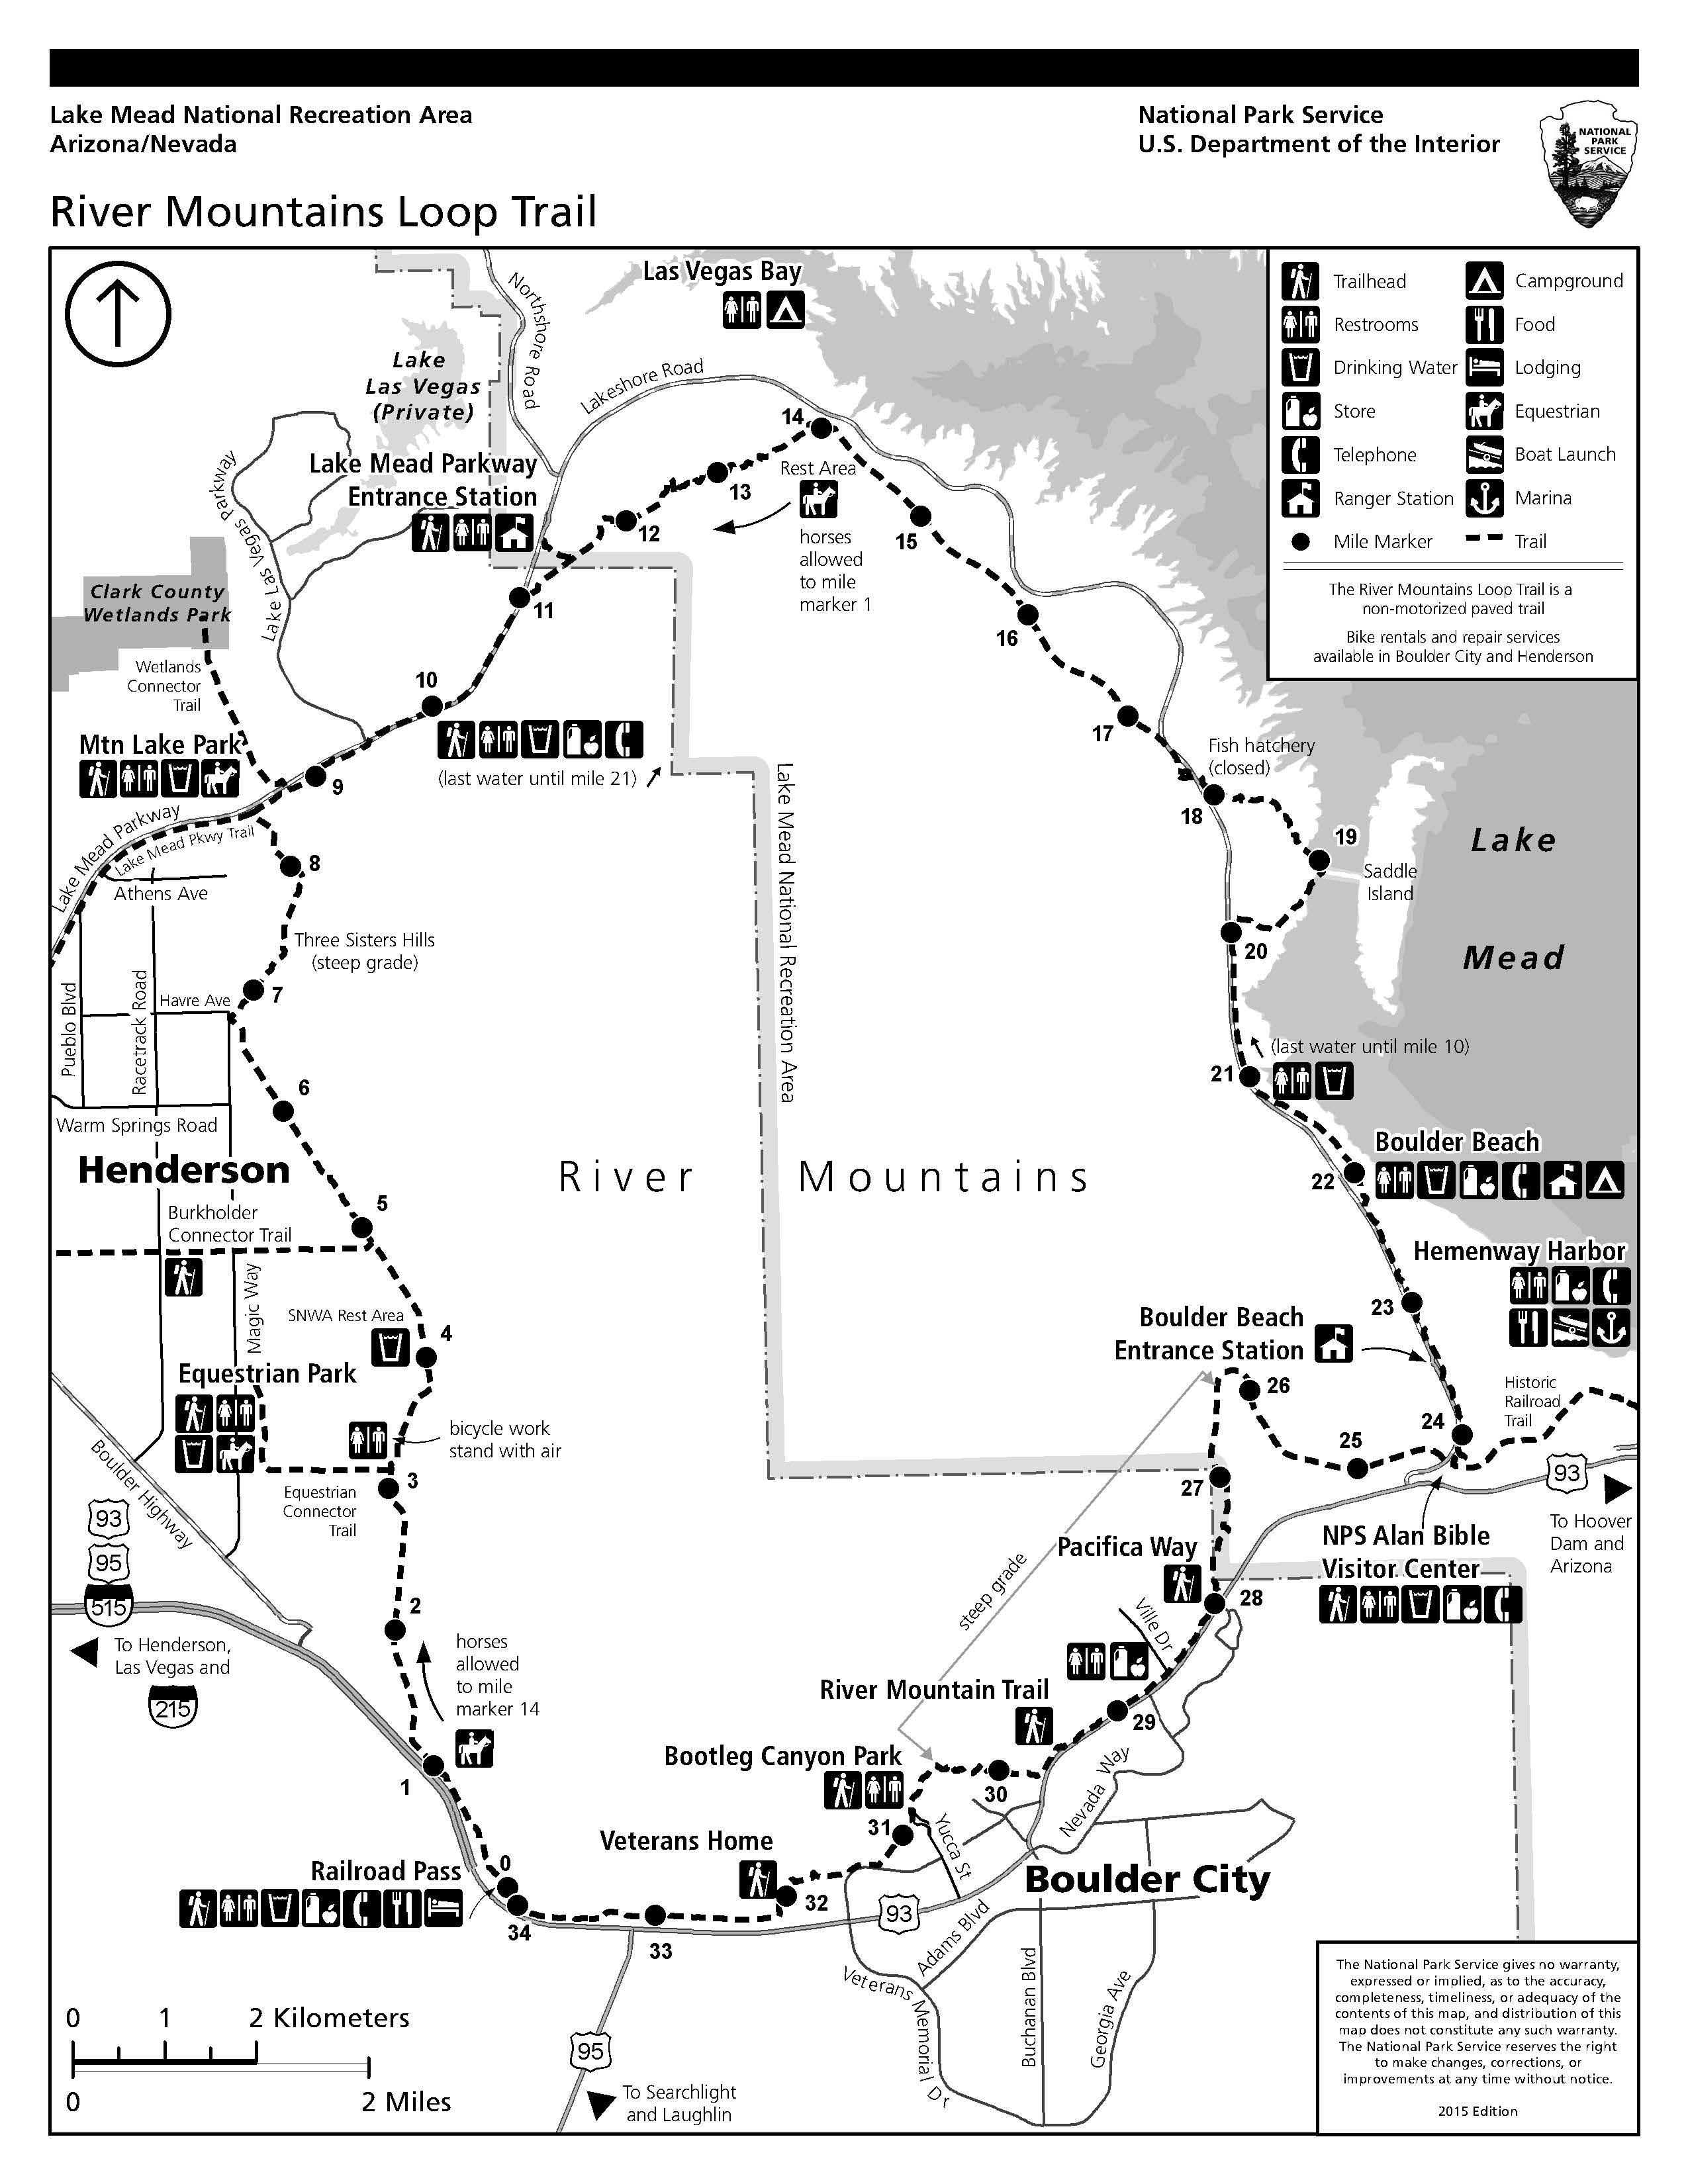 Hiking Lake Mead National Recreation Area US National Park Service